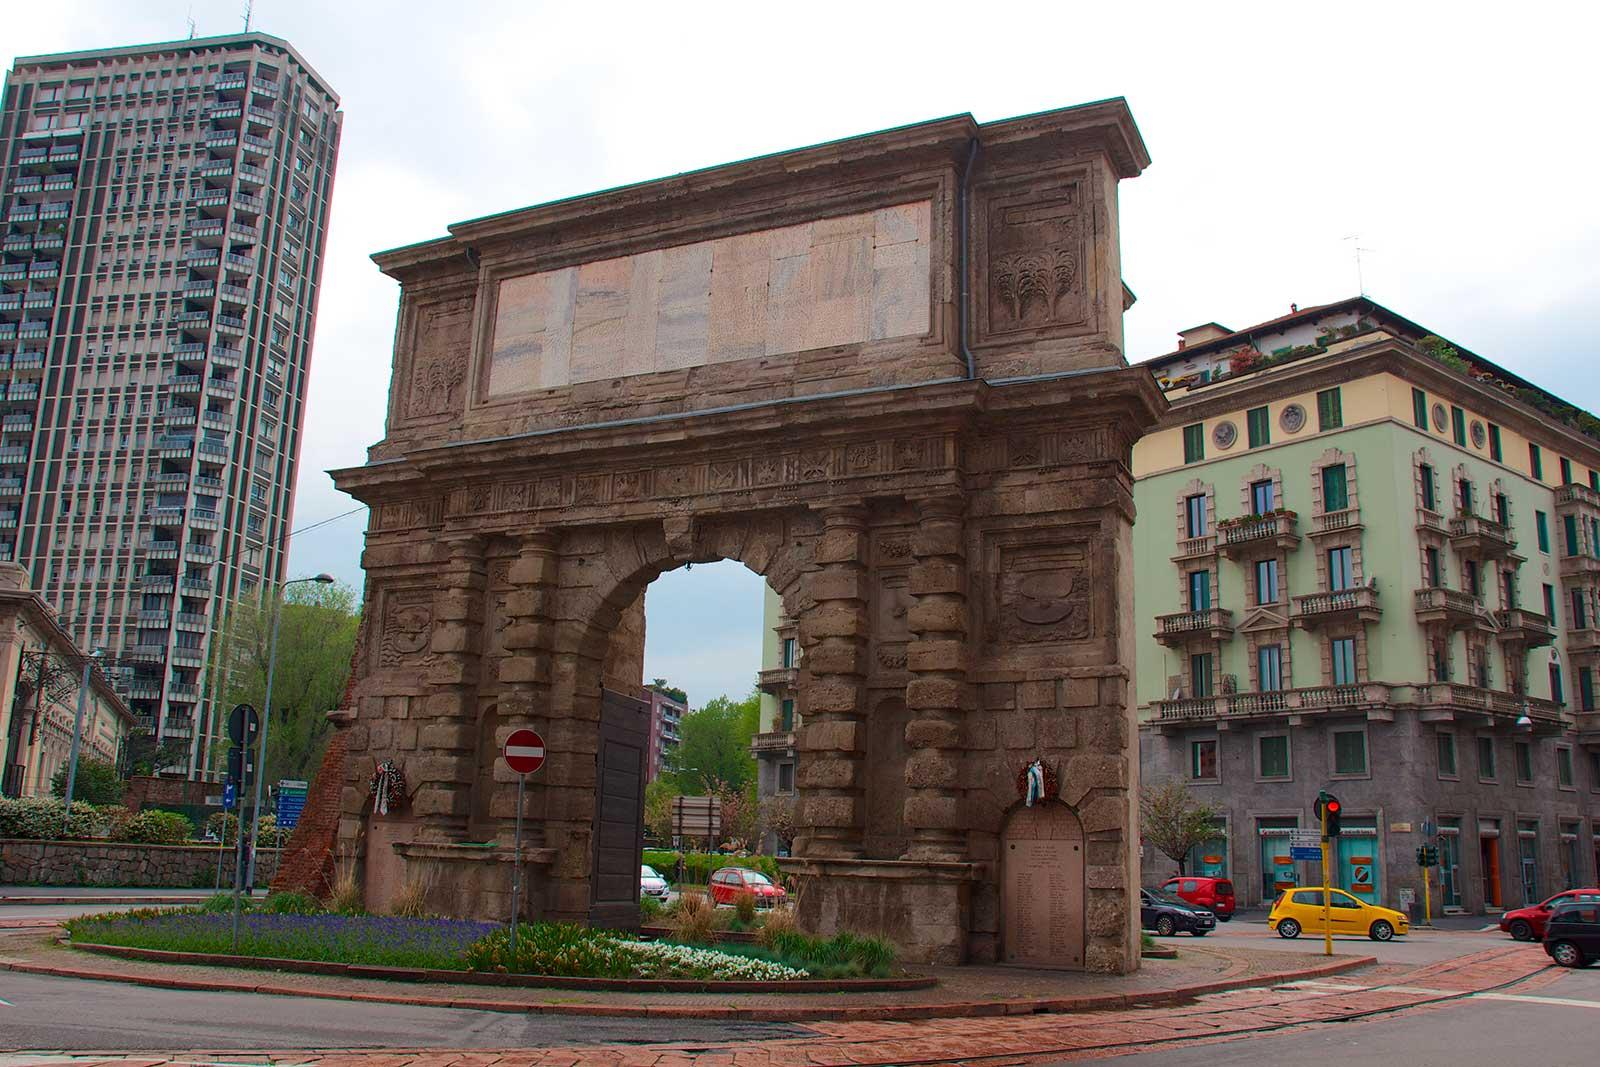 Porta romana milano monumenti in lombardia - Autoscuola porta romana milano ...